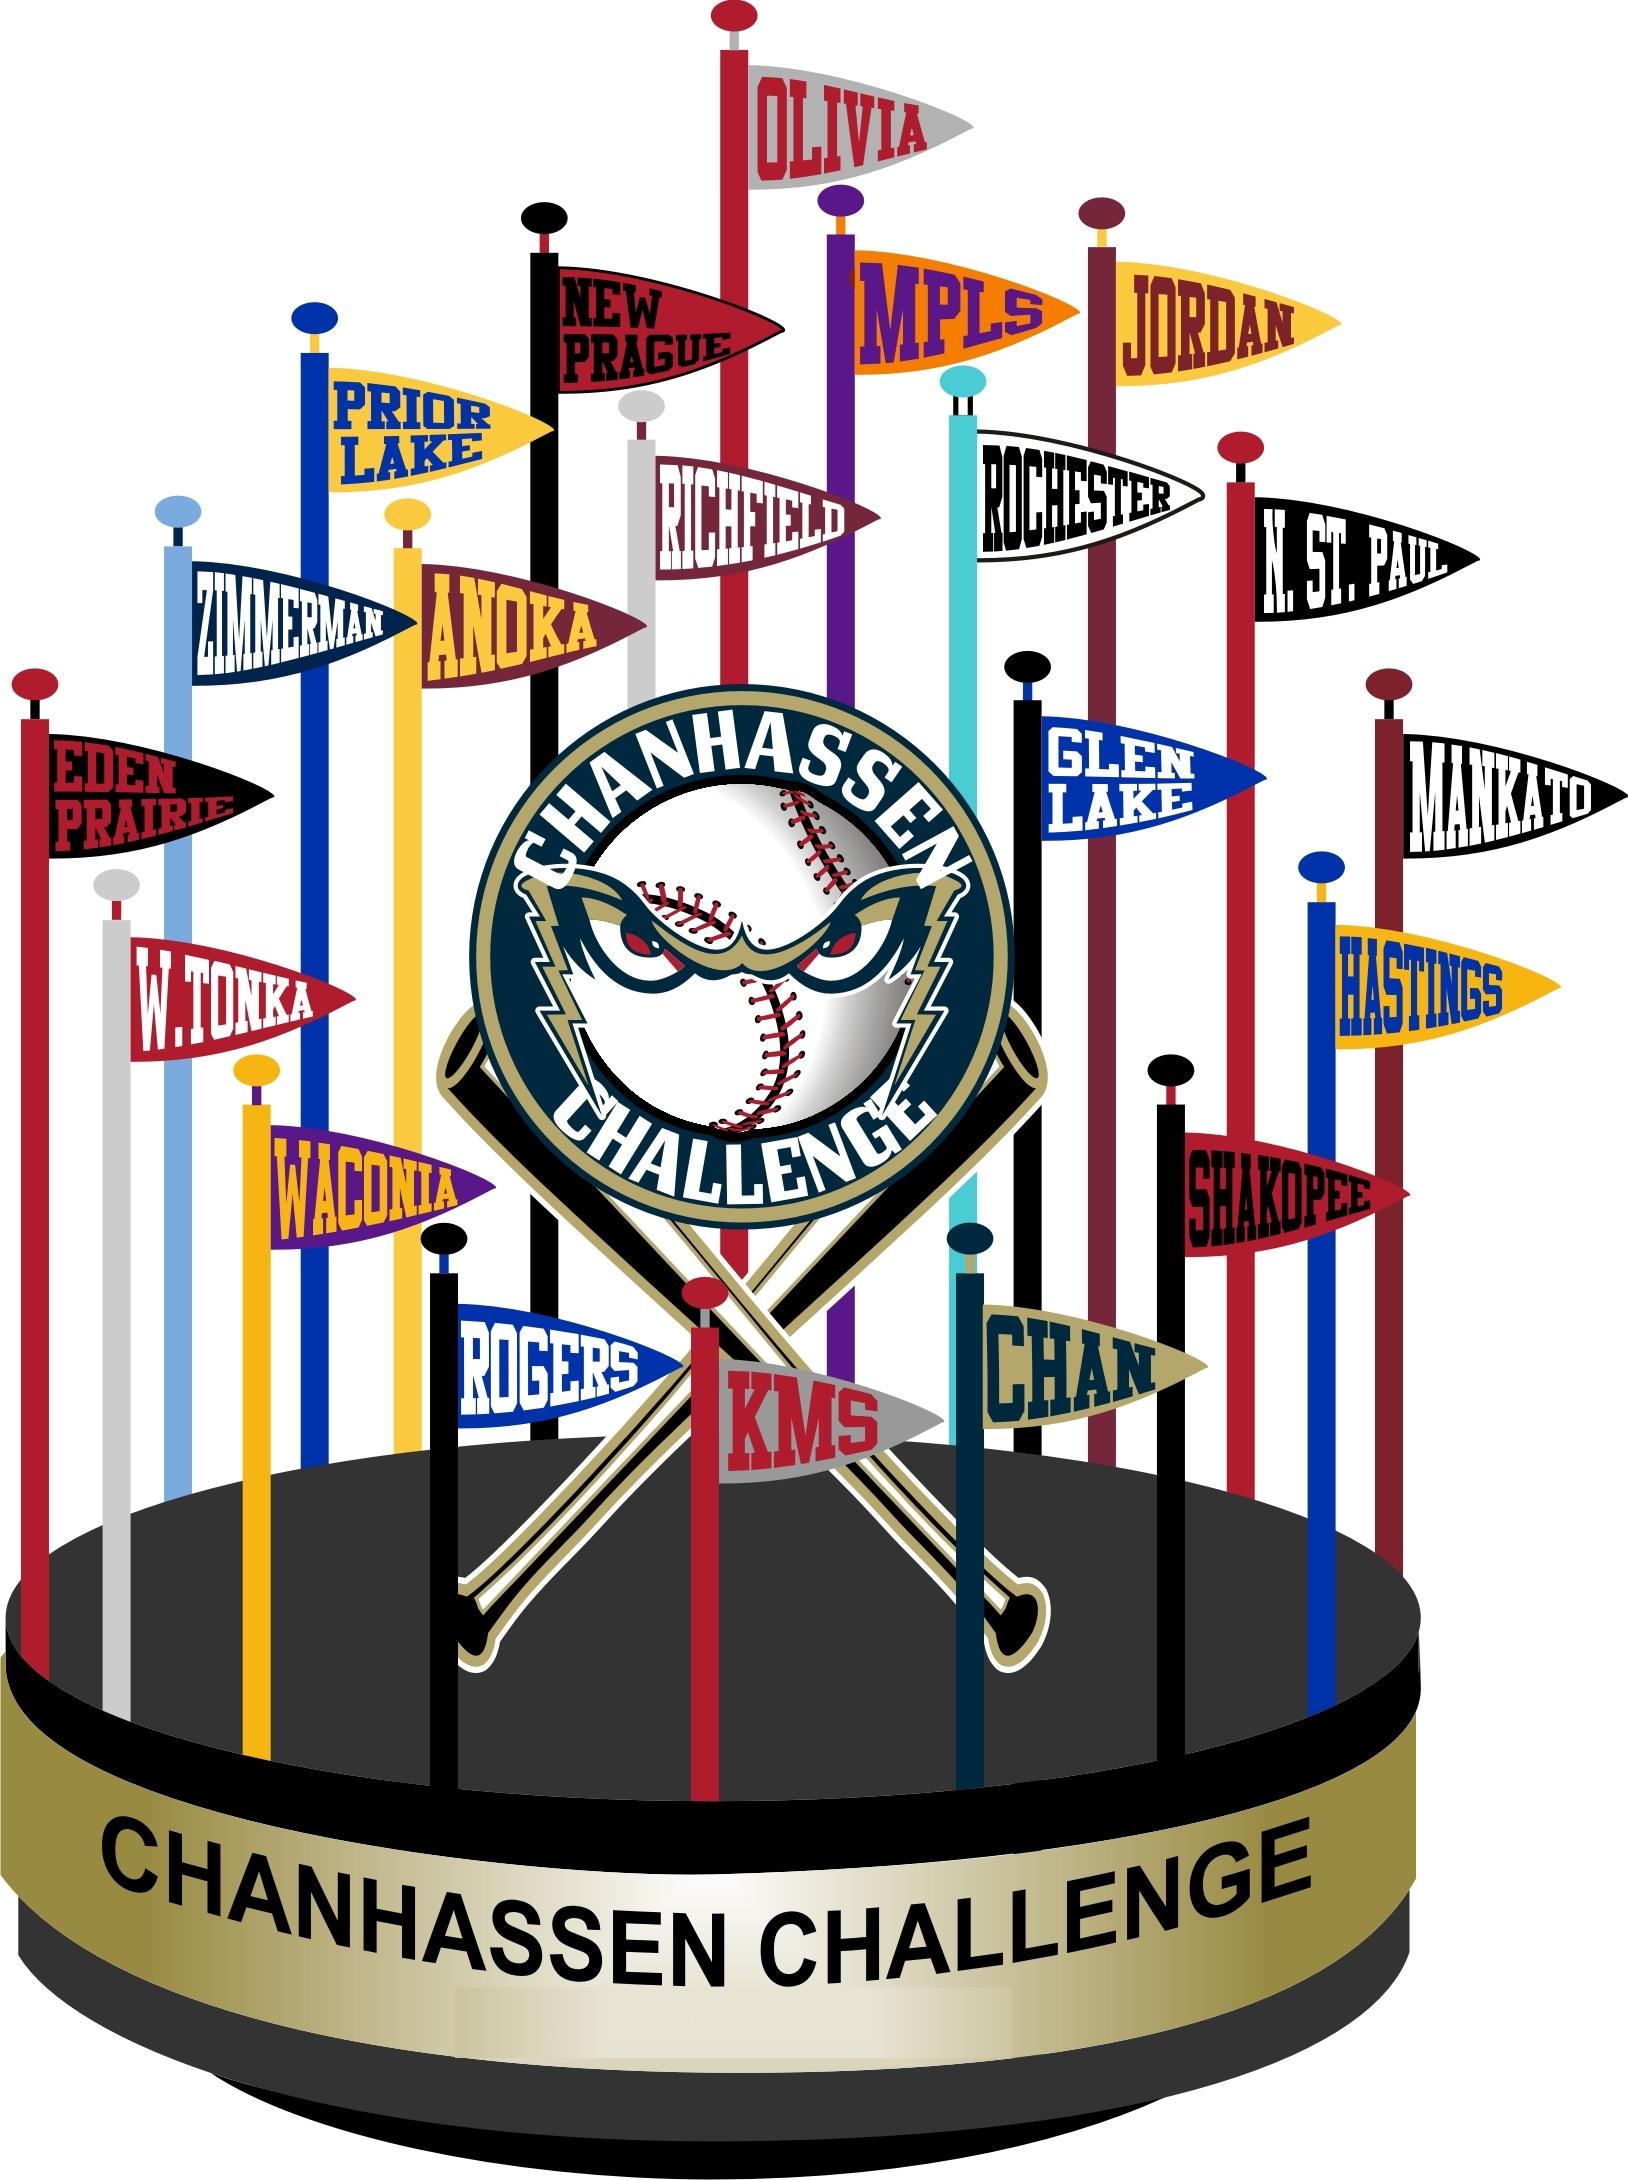 Chanhassen Challenge Trophy logo.jpg